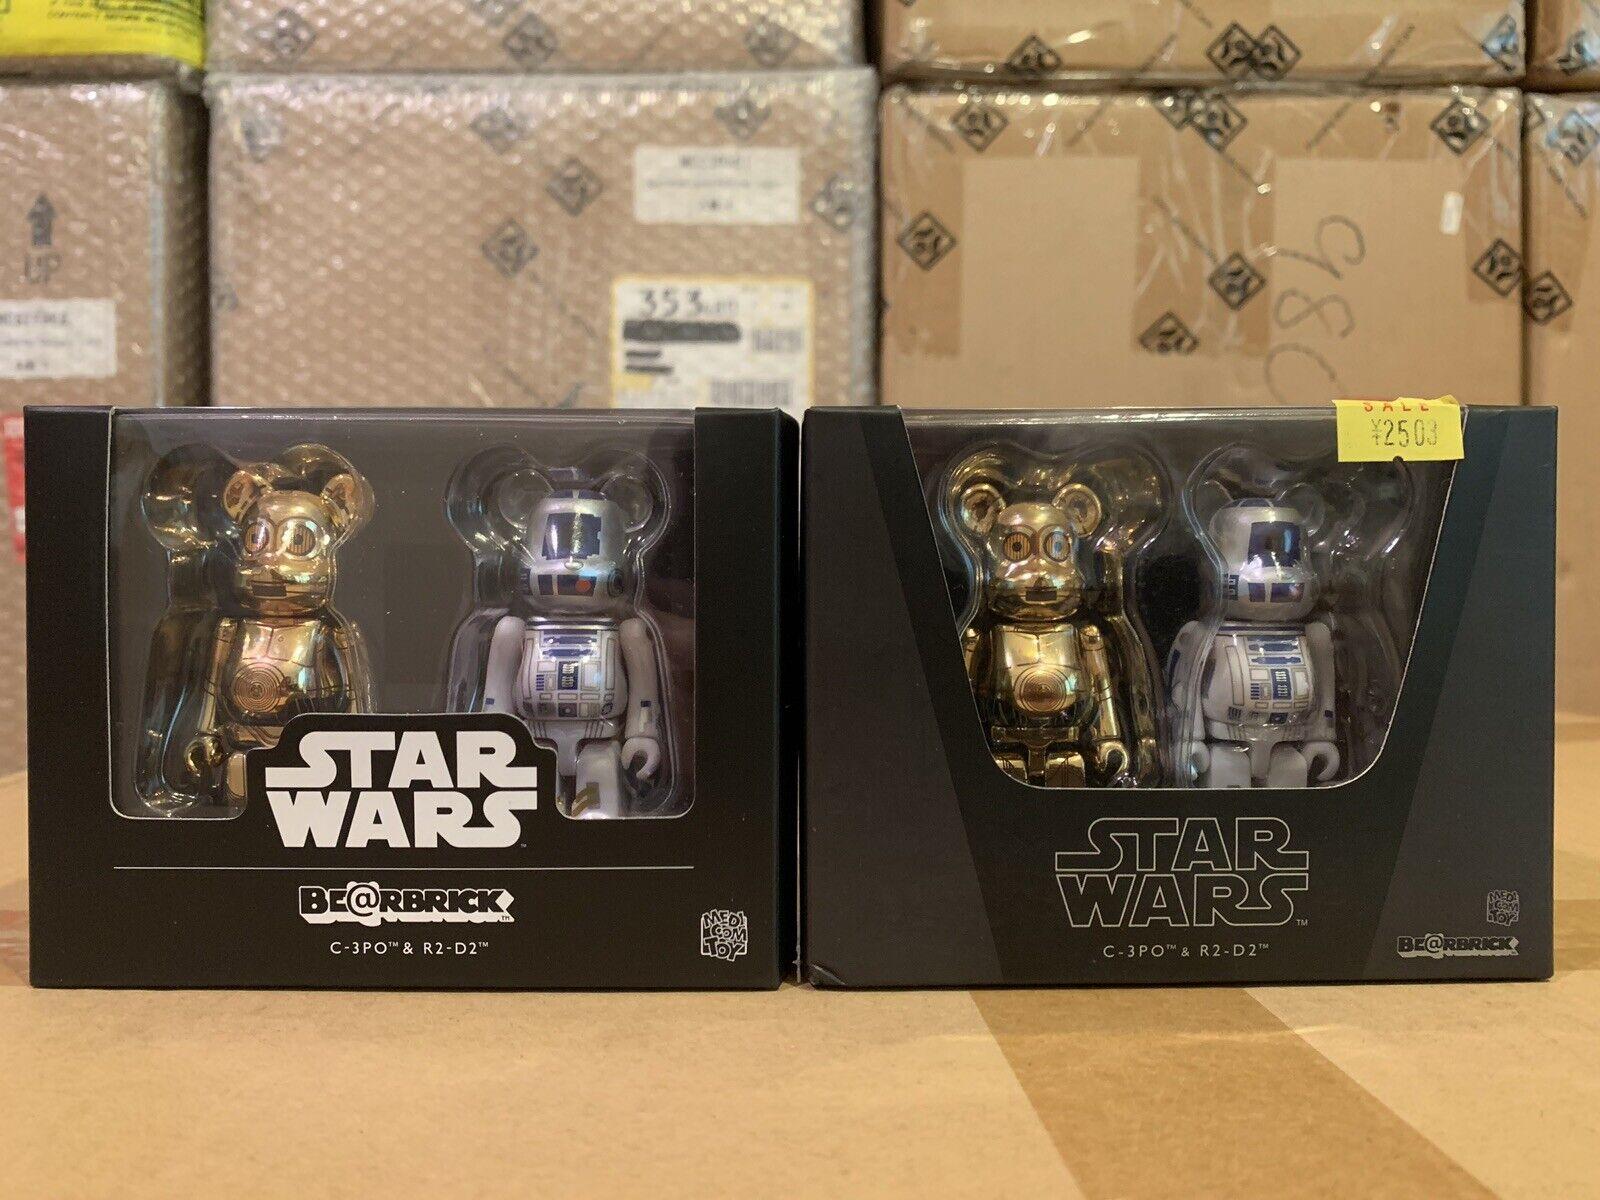 Rare Medicom Stern Wars C-3PO R2-D2 100% Bearbrick Be@rbrick Box 2 of 2 set pcs